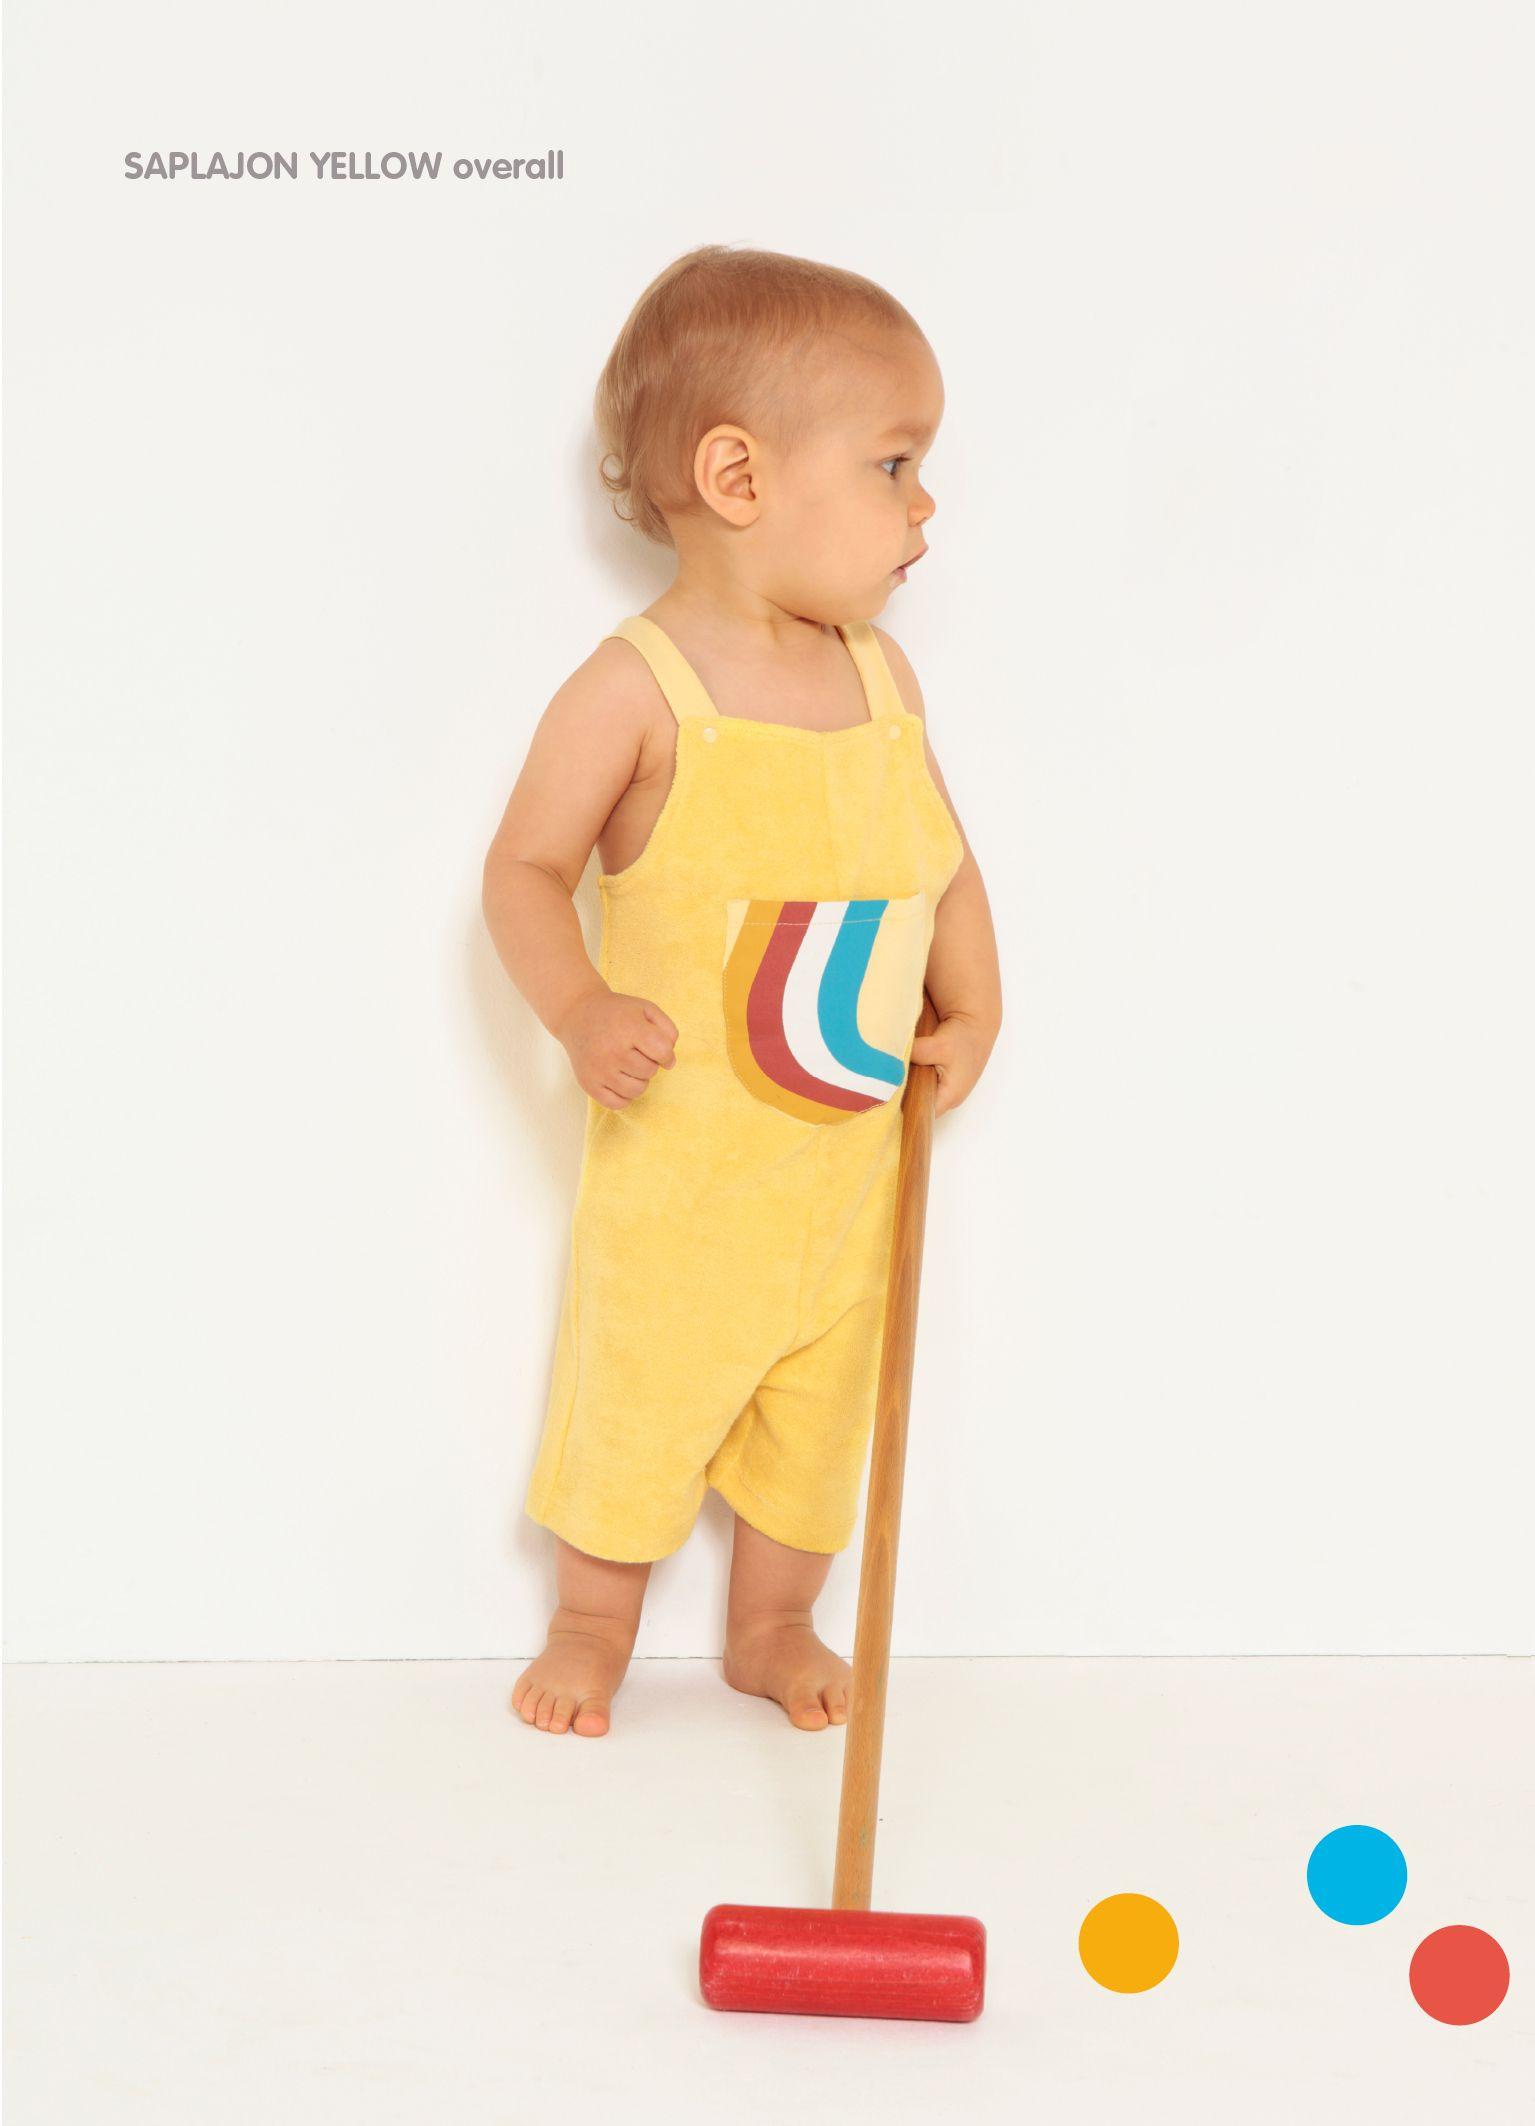 Yellow terry Saplayon shortsjohn with rainbow pocket - Dis Une Couleur